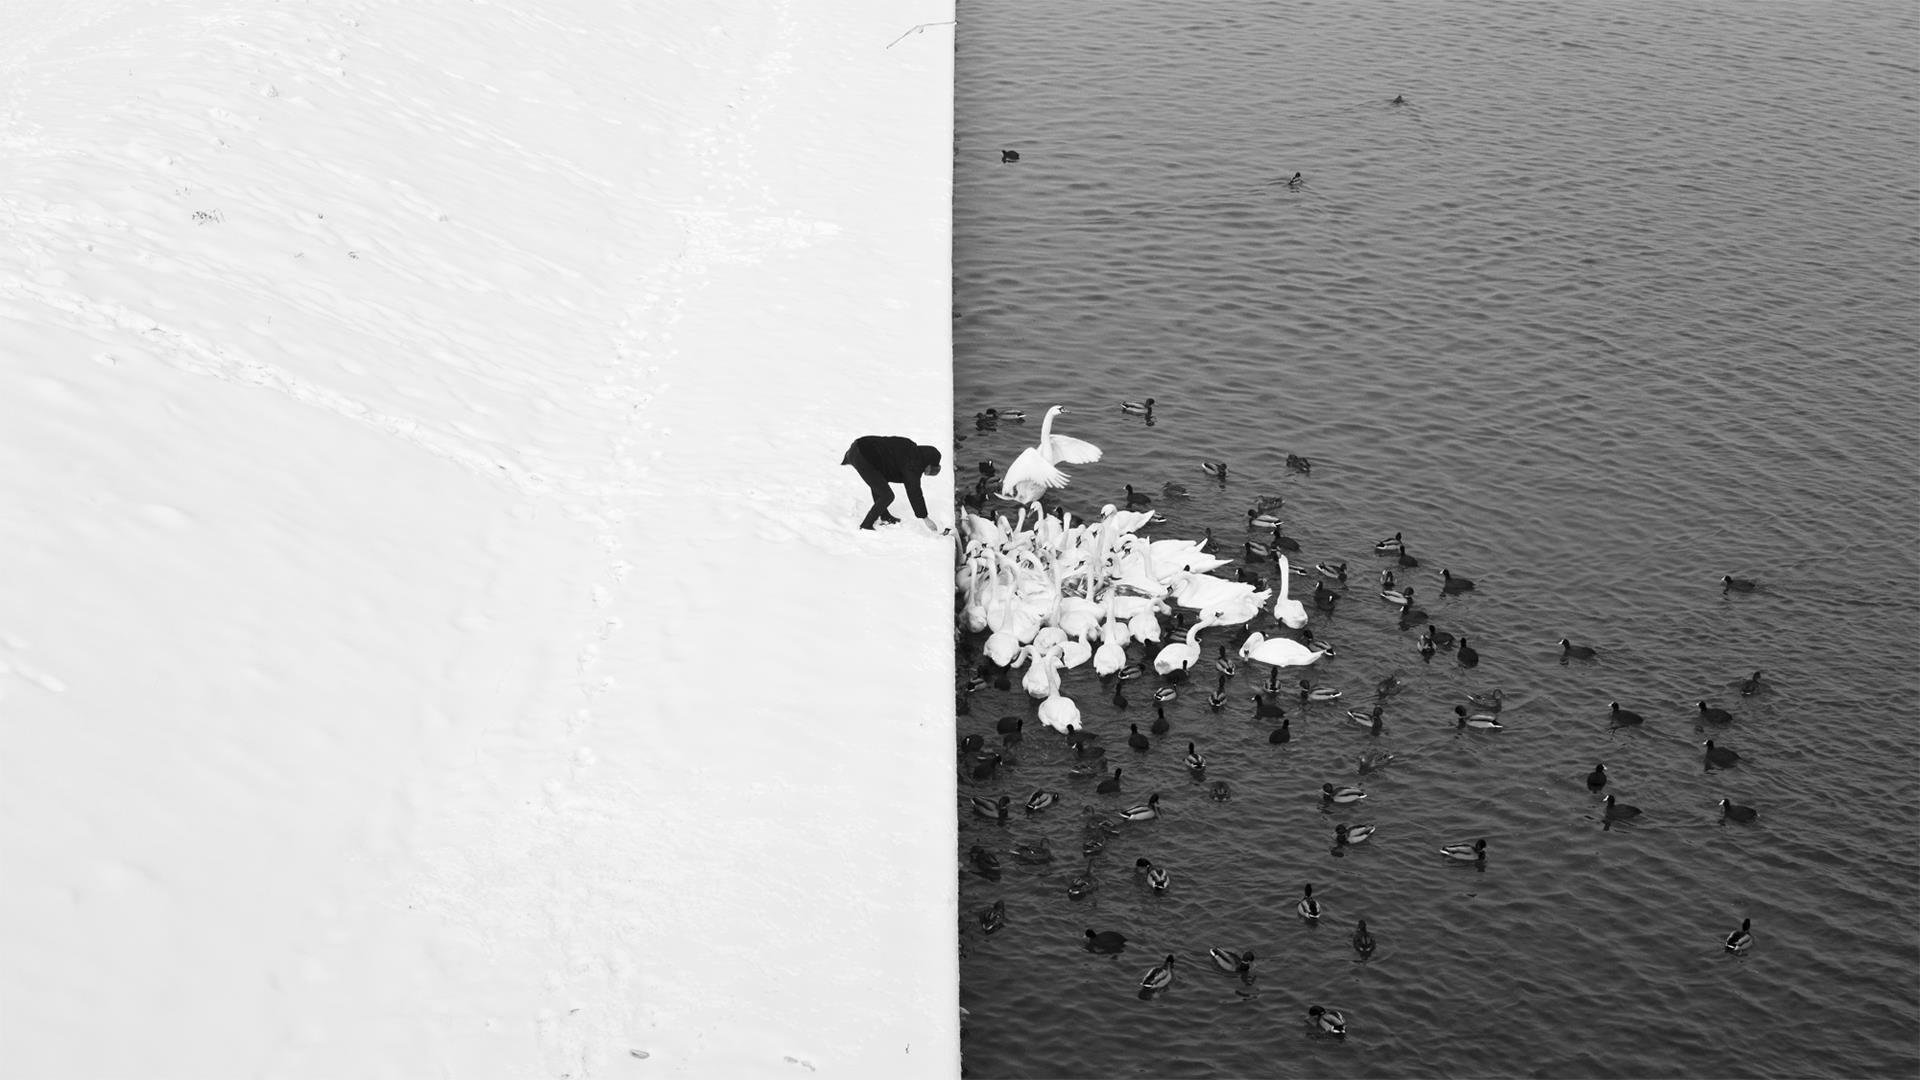 Black and white photograph of man feeding swans and ducks by Marcin Ryczek